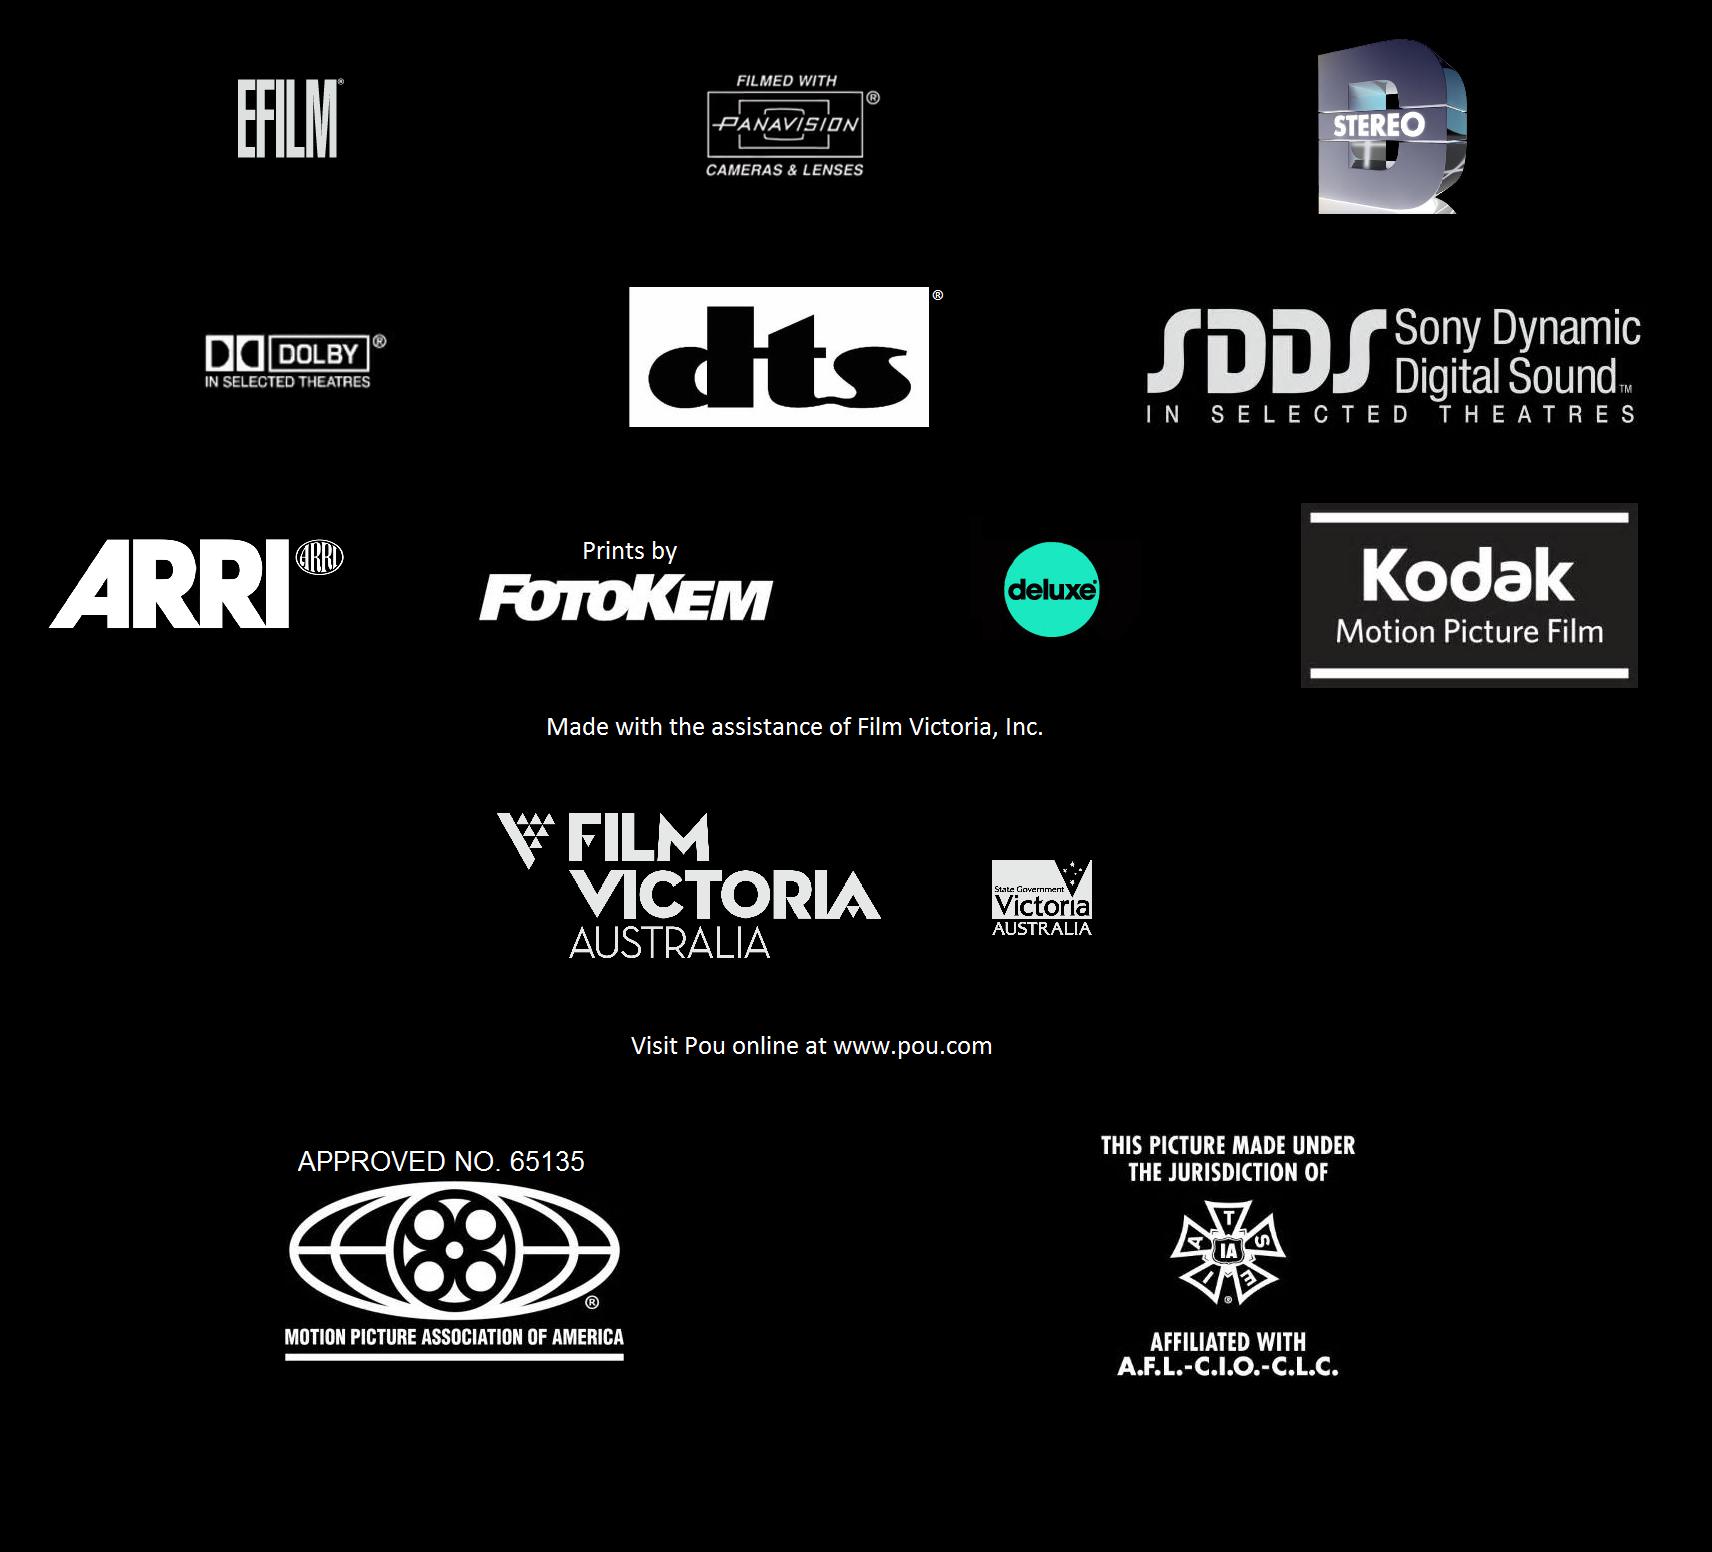 Timeline Movie Logo Wiring Diagrams Opamp Diode Laser Driver Circuit Diagram Tradeoficcom The Pou Wiki Fandom Powered By Wikia Rh Com